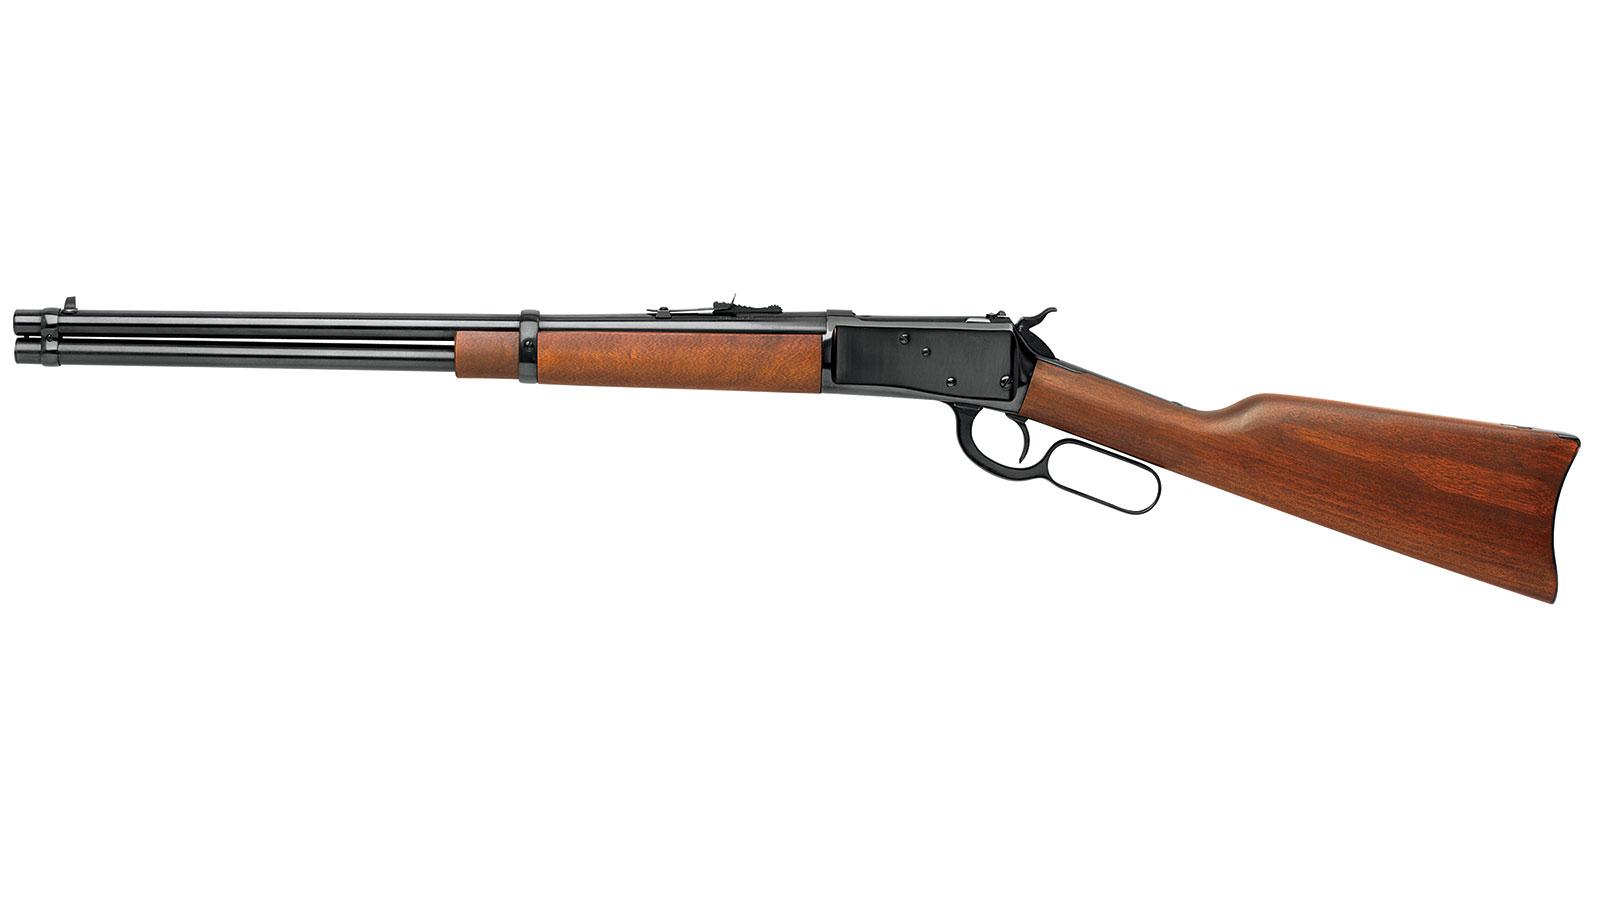 Rossi 923571613 R92 Lever Action Carbine 357 Magnum|38 Special 16 8+1 Brazillian Hardwood Stk Blued in.